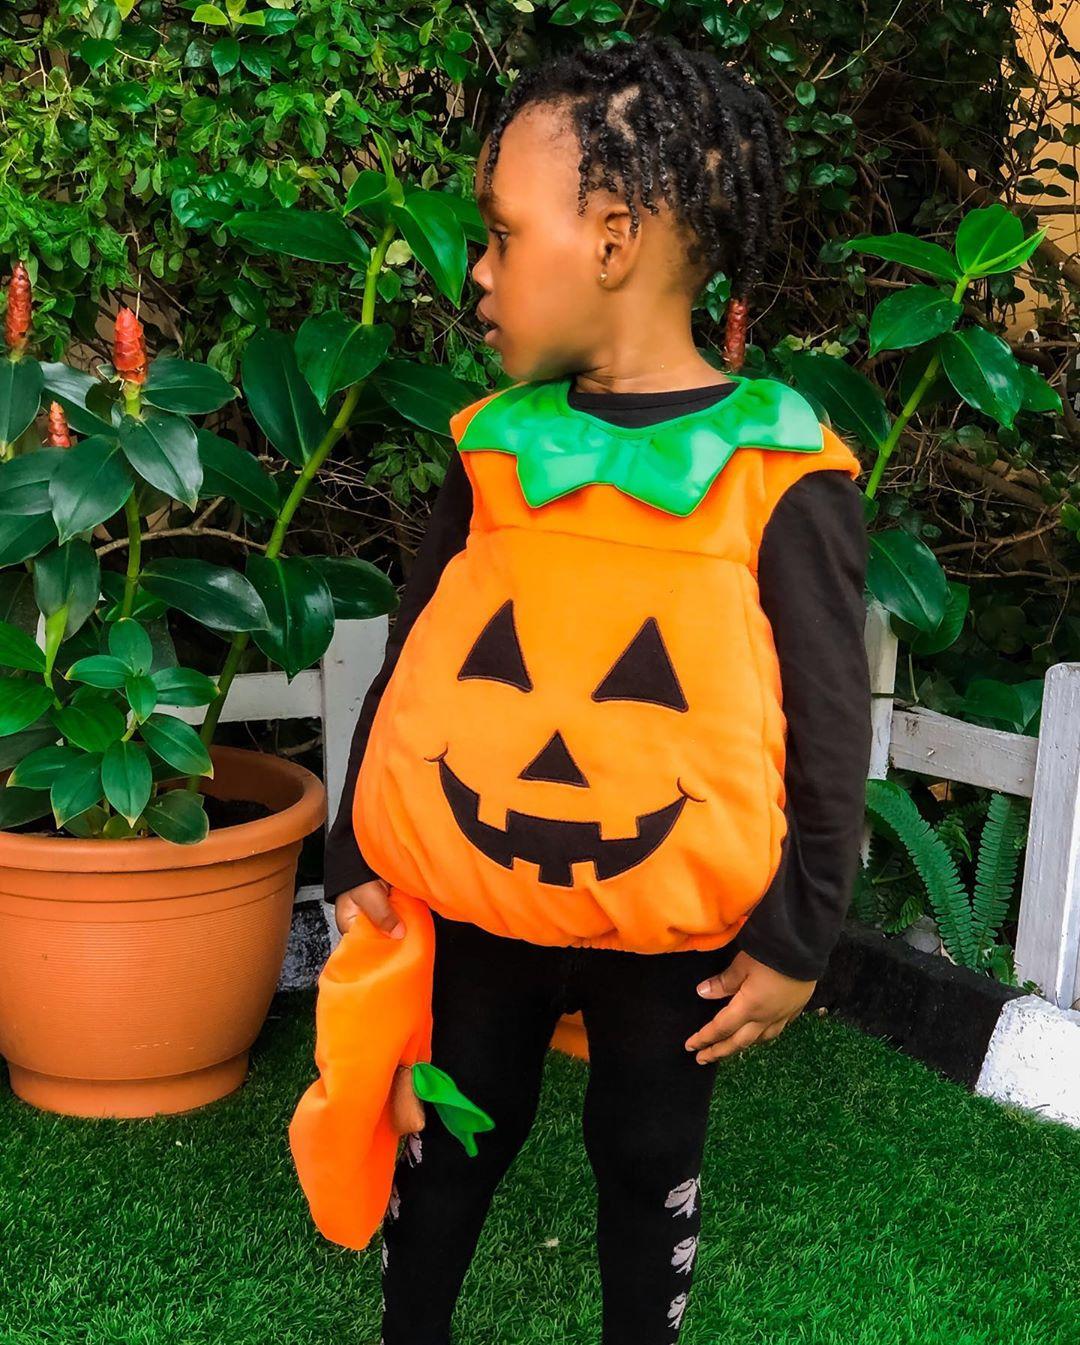 Jude & Ify Okoye's Daughter Eleanor is a Cute Lil' Pumpkin for Halloween 🎃